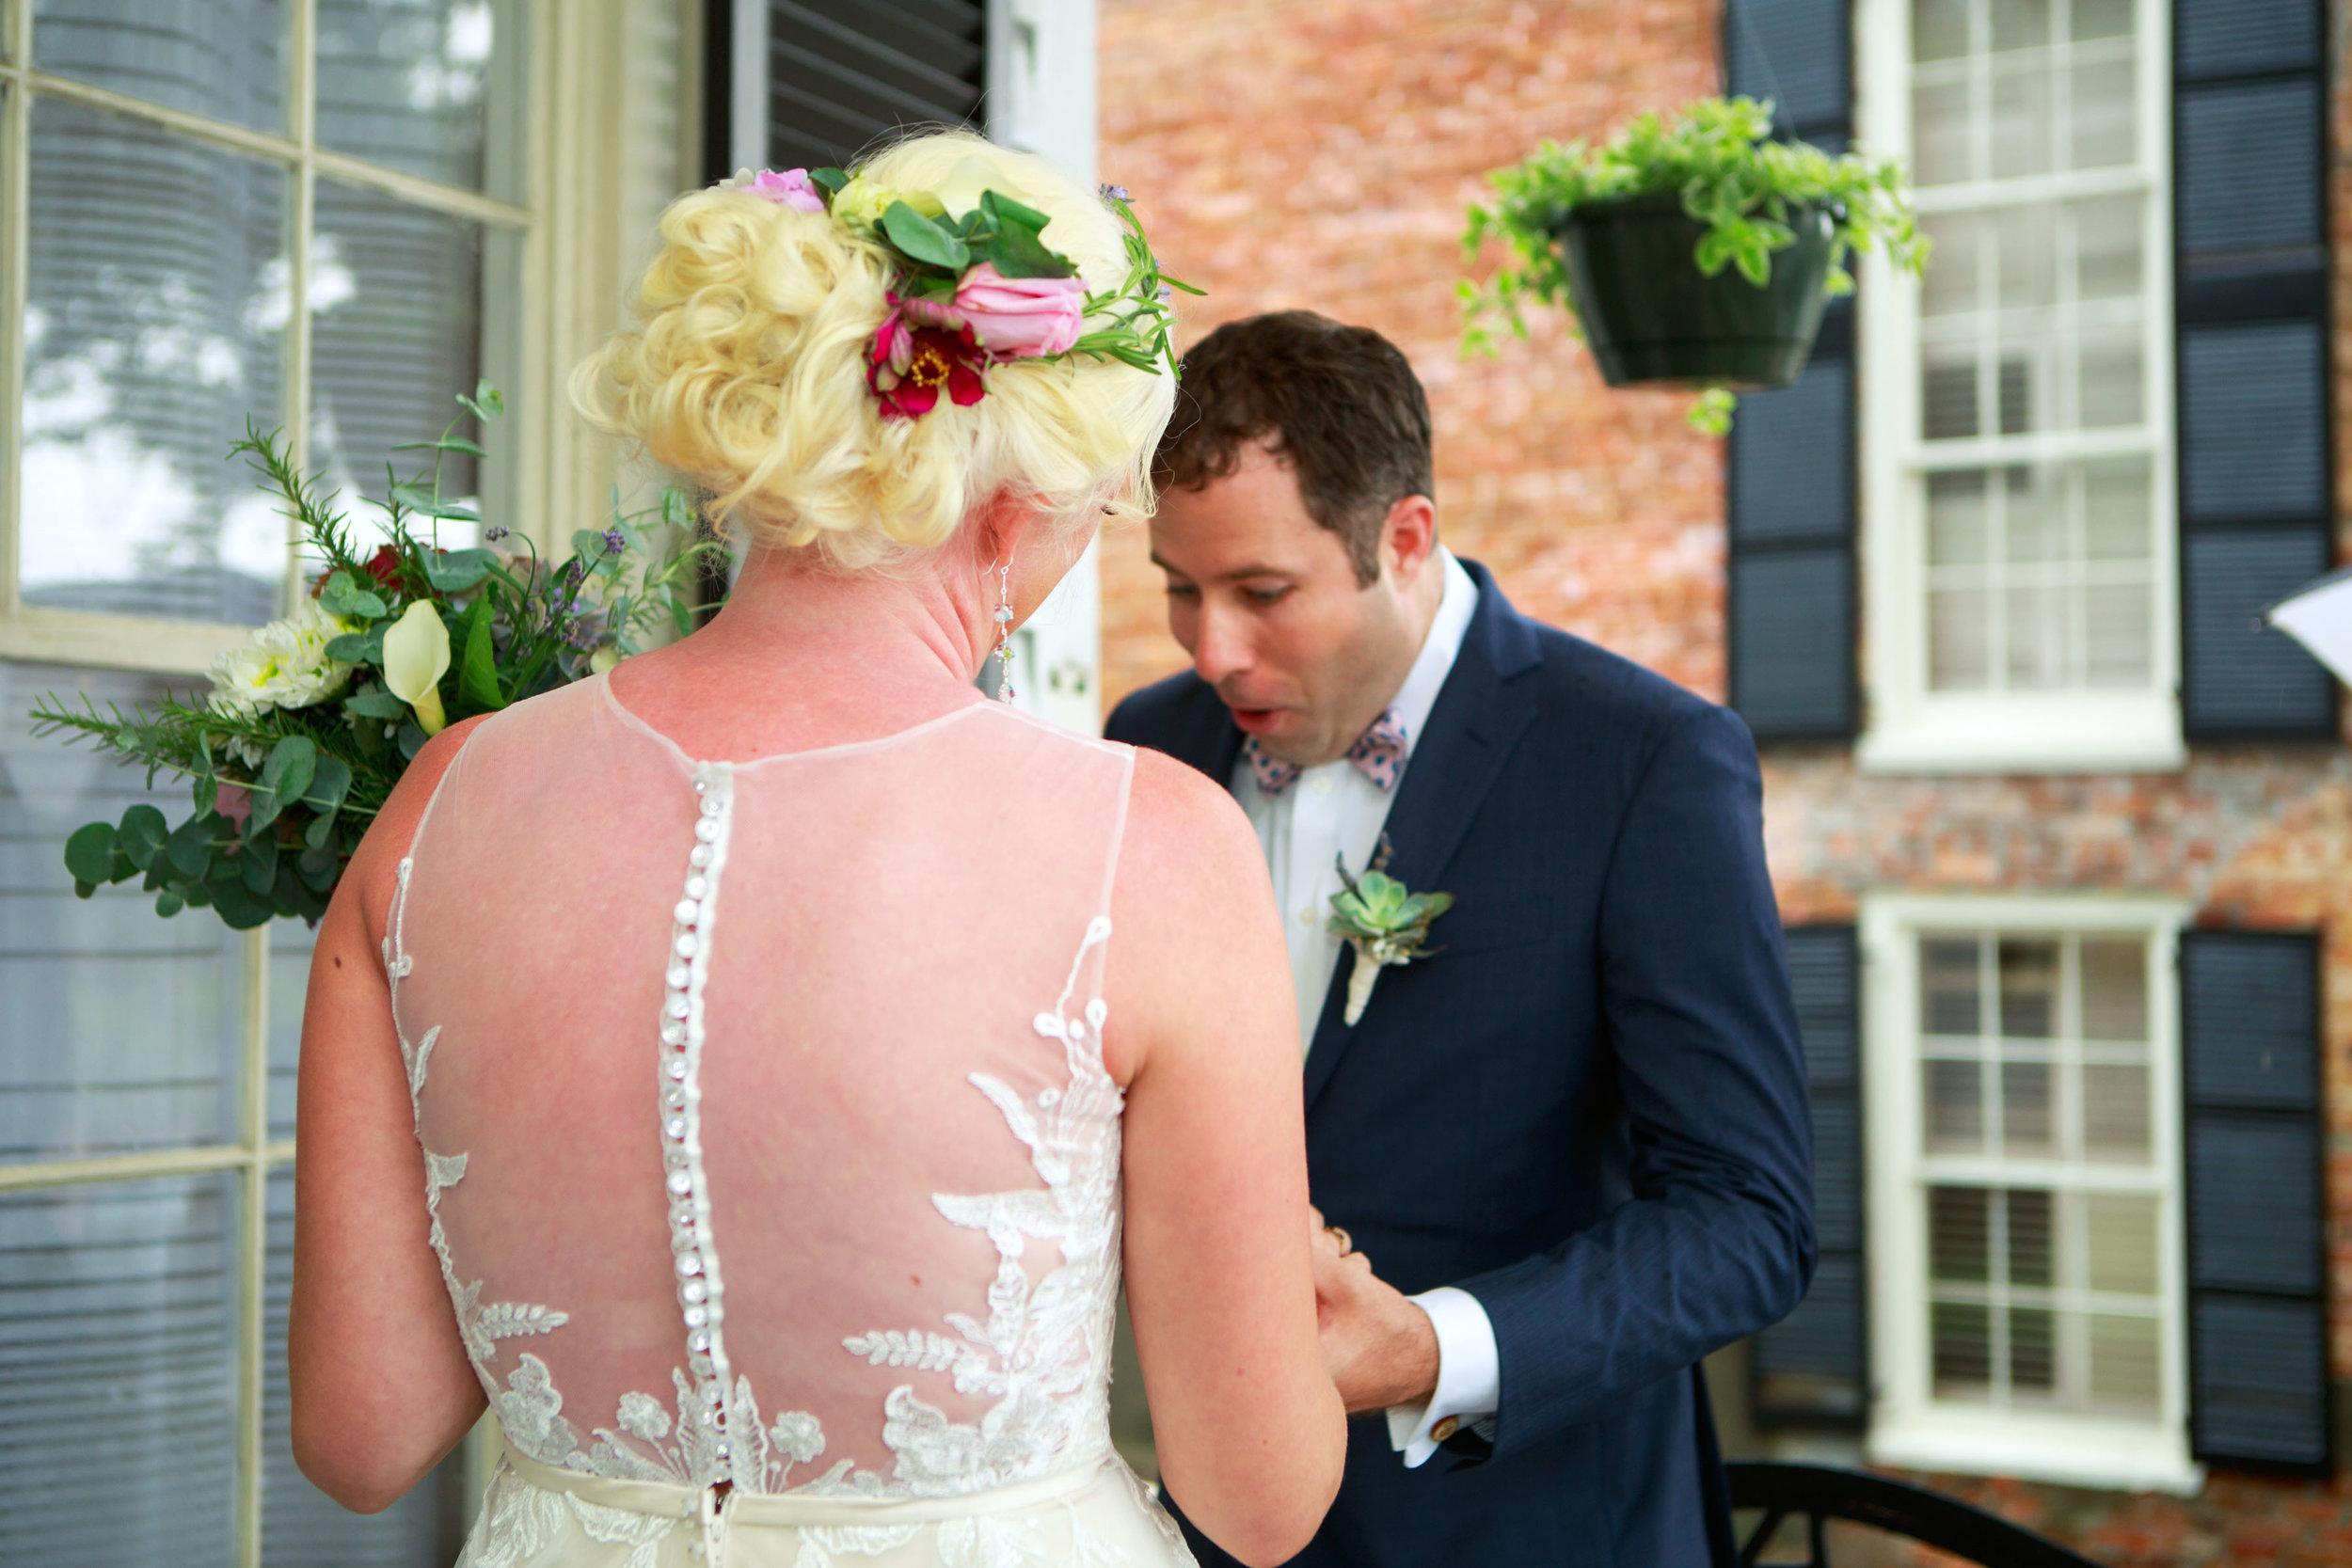 128-South-Wedding-Tiffany-Abruzzo-Photography-First-Look-4.jpg